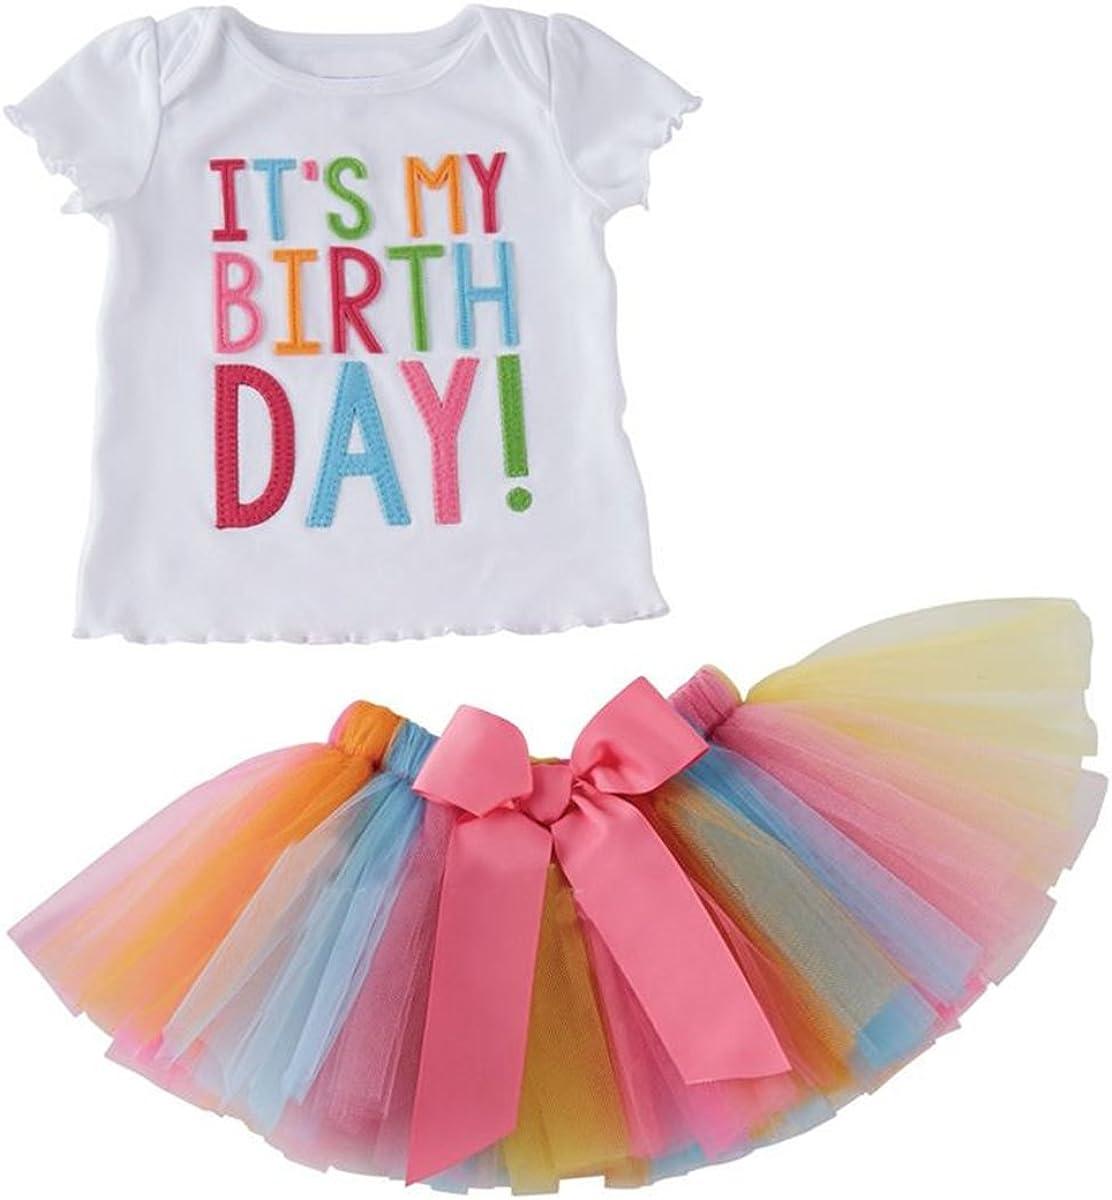 Ruffled Leggings Birthday tutu Sweet Sassy SIx Top Birthday girl shirt Birthday Girl tutu Outfit Rainbow tutu Rainbow Birthday